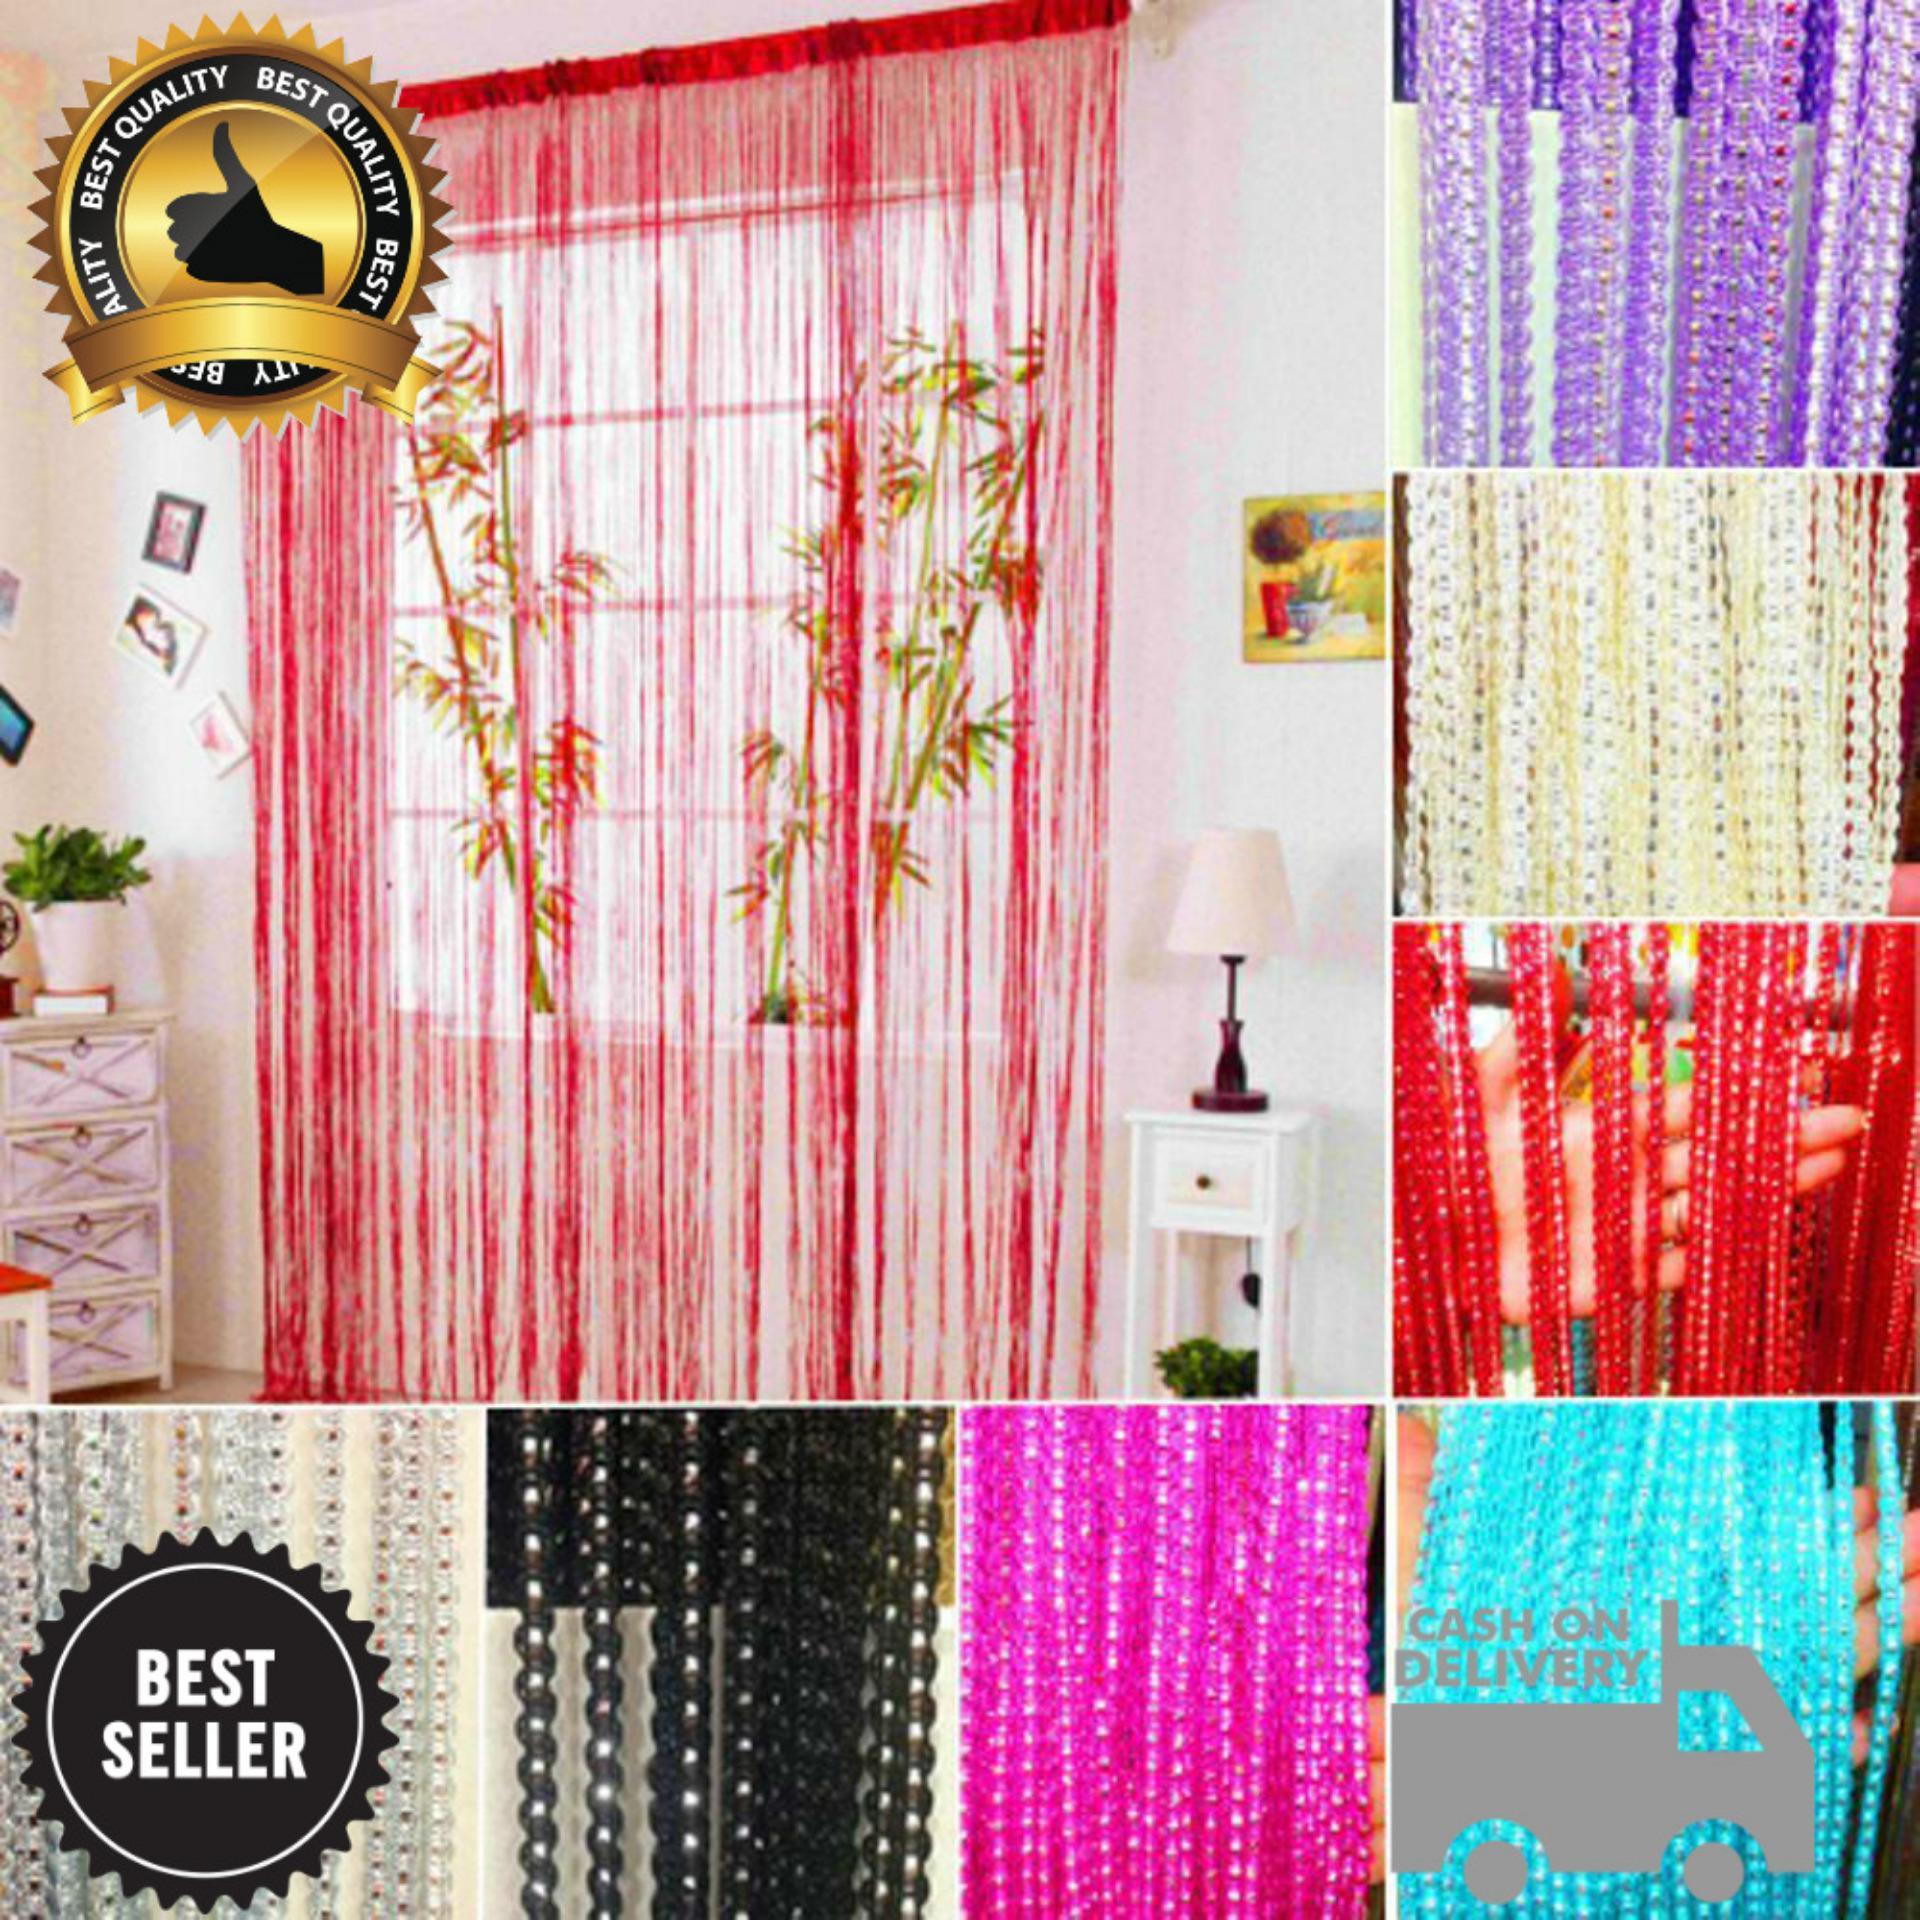 Big King Shop - Tirai Benang Motif Halus Fashion Dekorasi Warna Terbaru